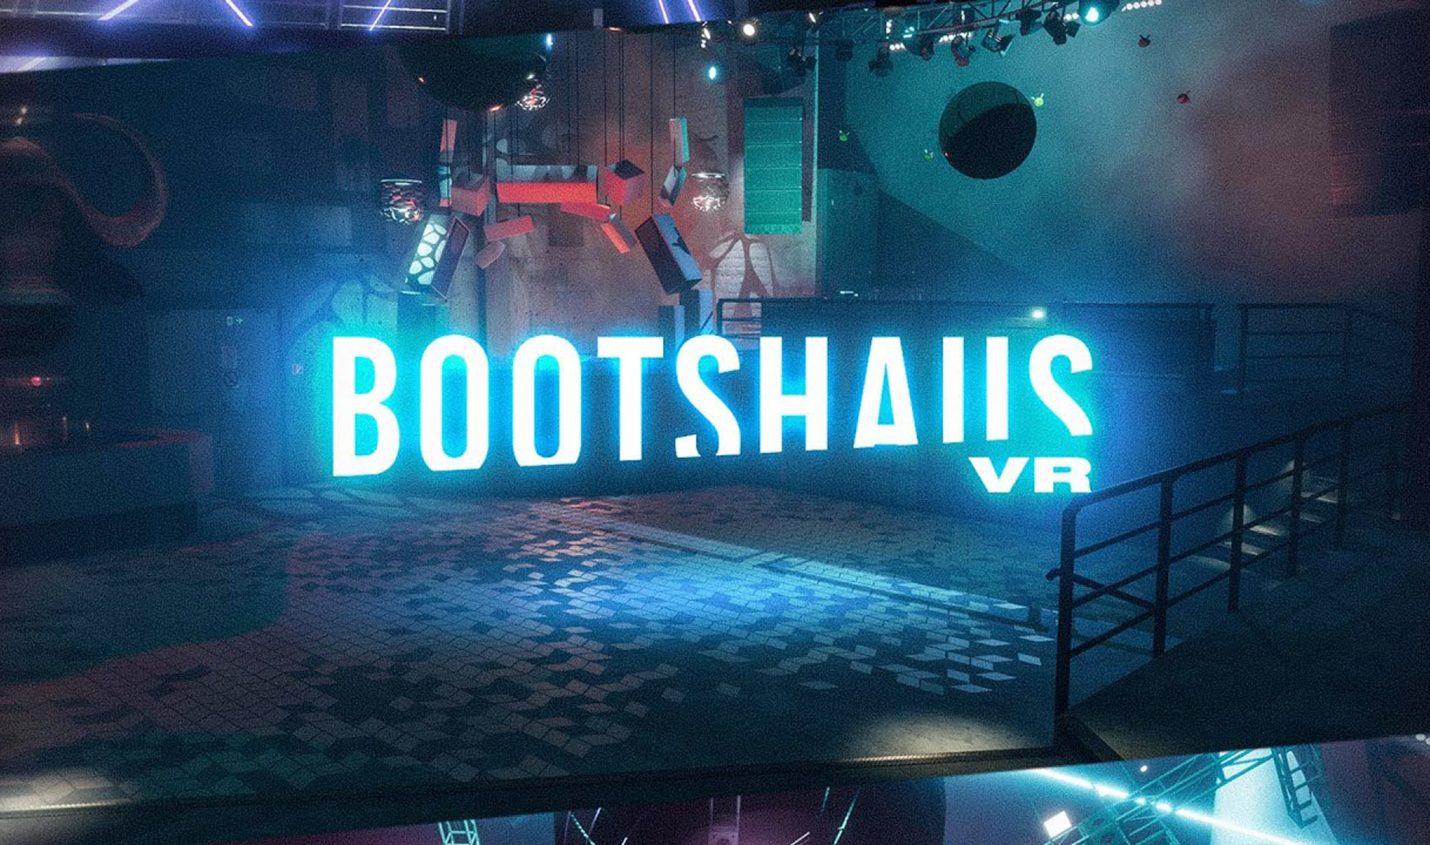 Bootshaus startet Club in Virtual Reality